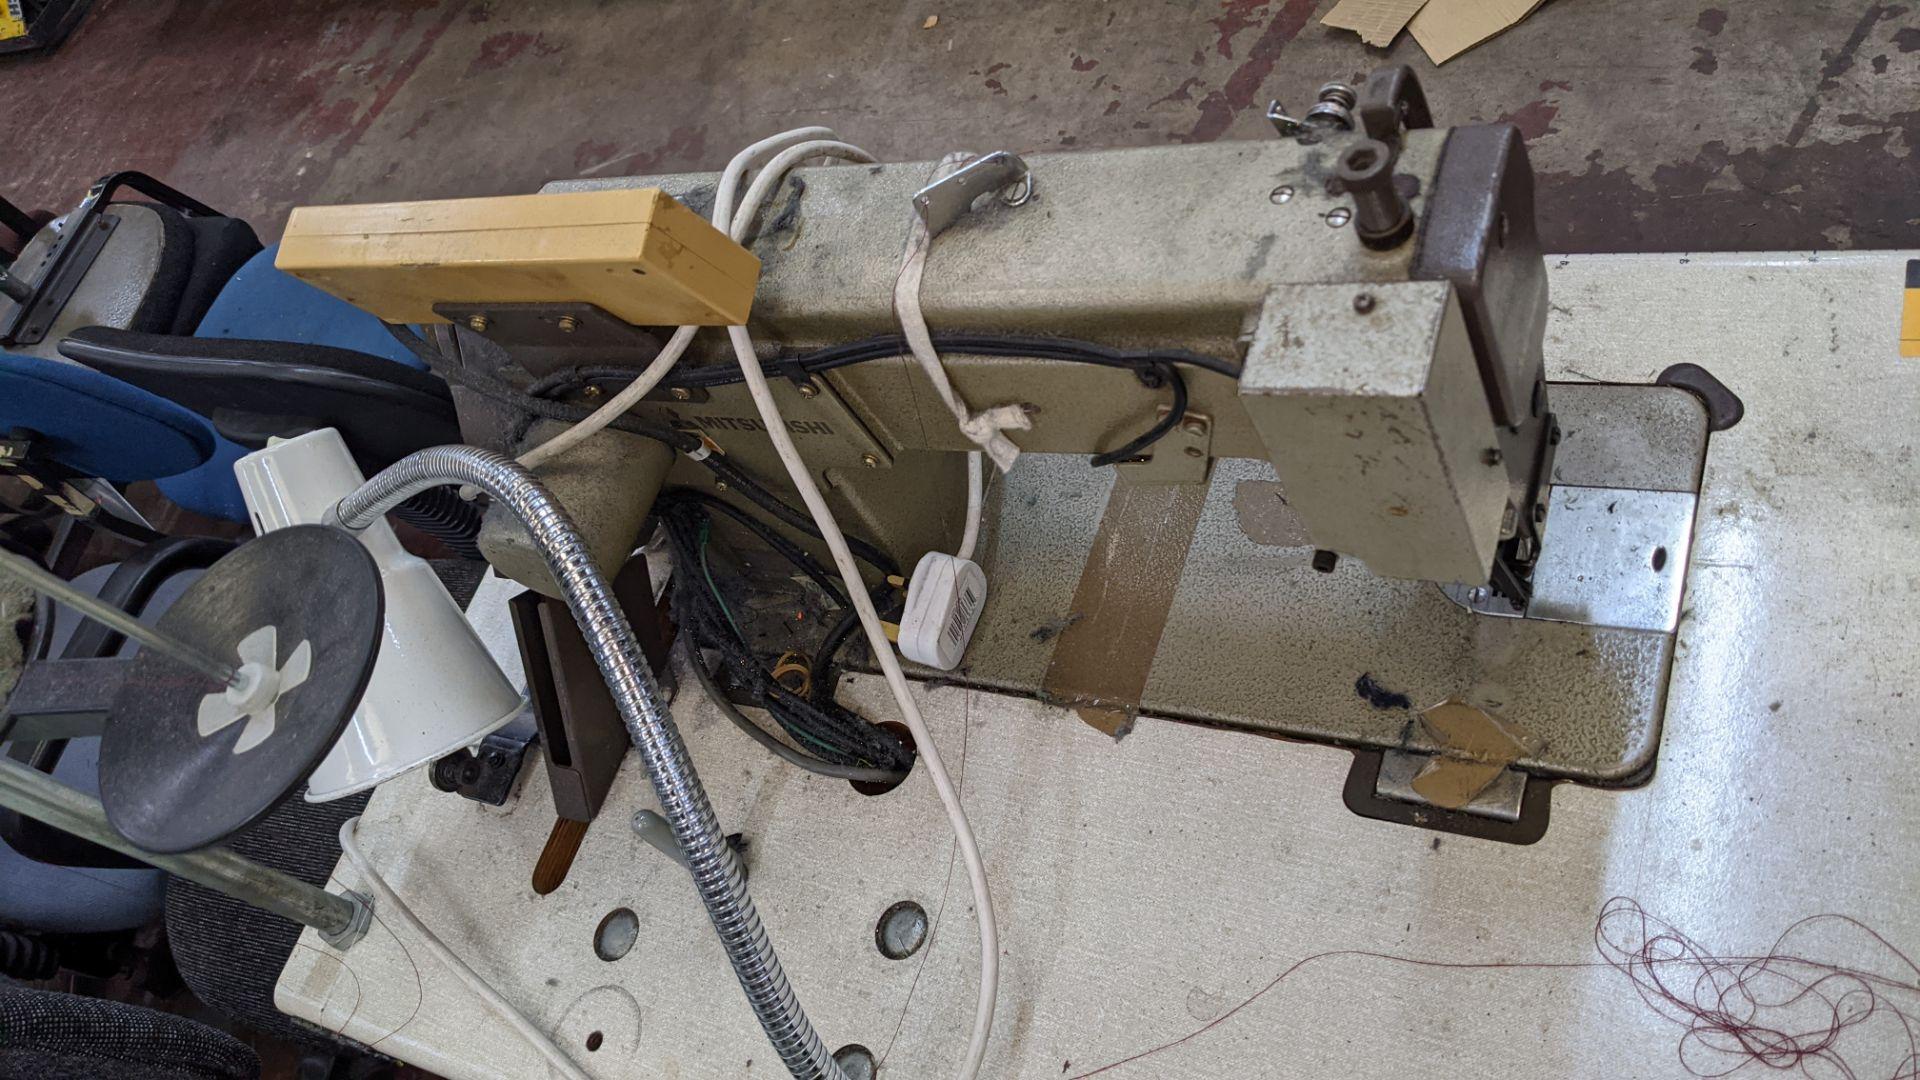 Mitsubishi LS2-180 sewing machine with Mitsubishi LF-C8 digital controller - Image 9 of 12